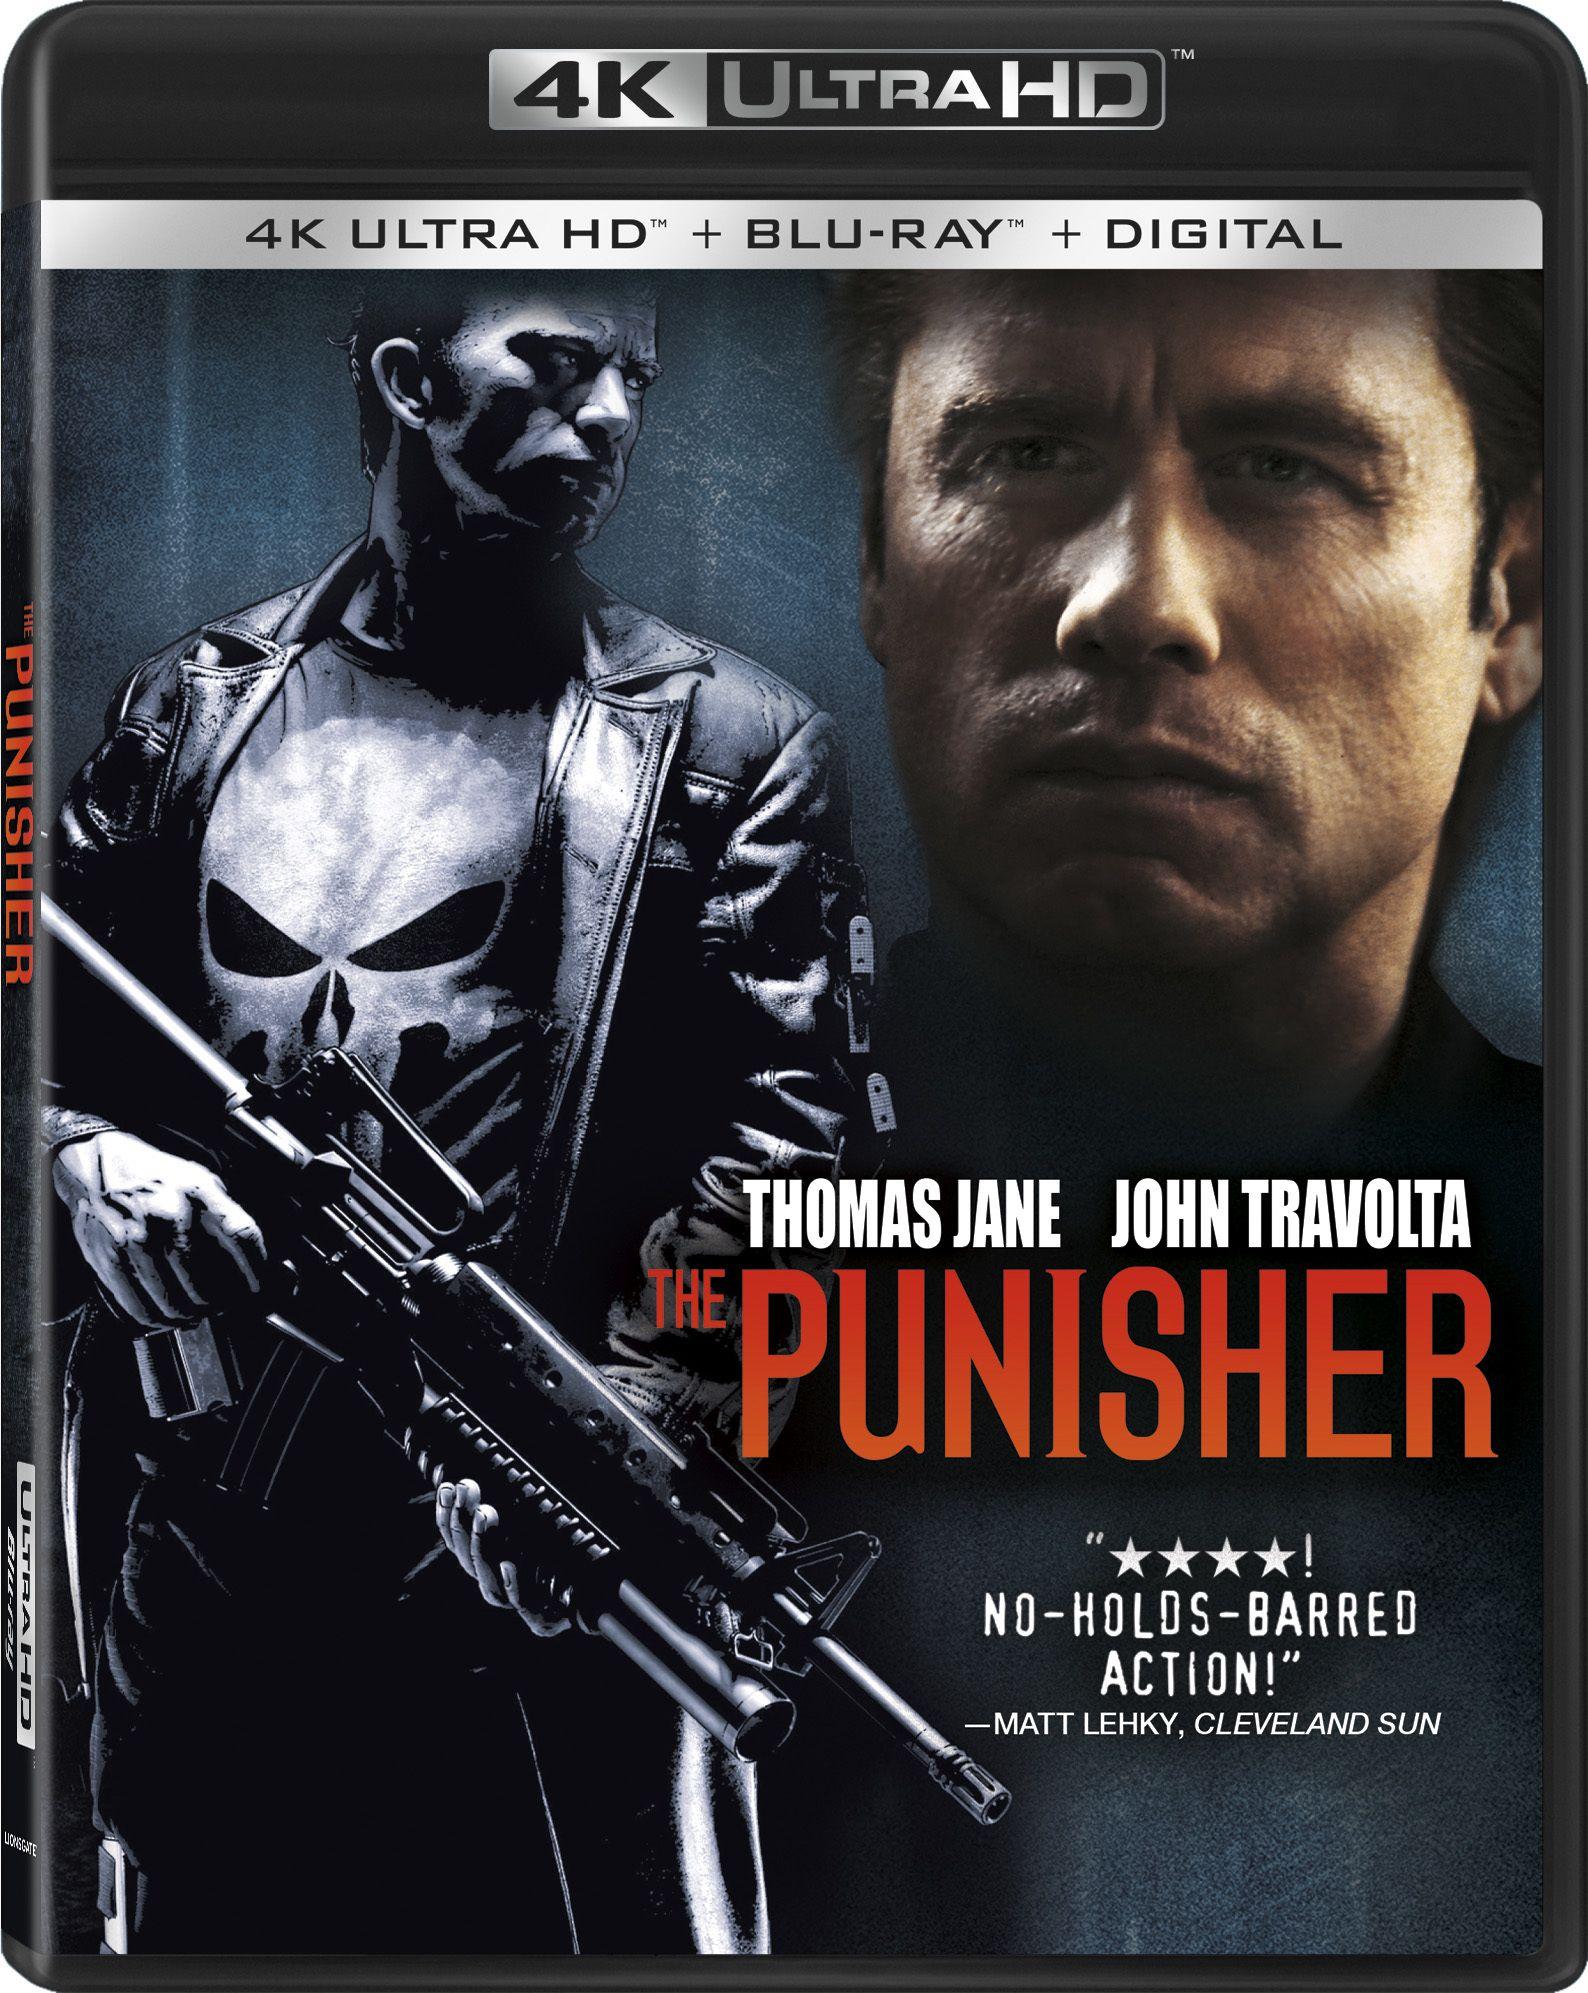 The Punisher The Punisher Movie Punisher 2004 Punisher